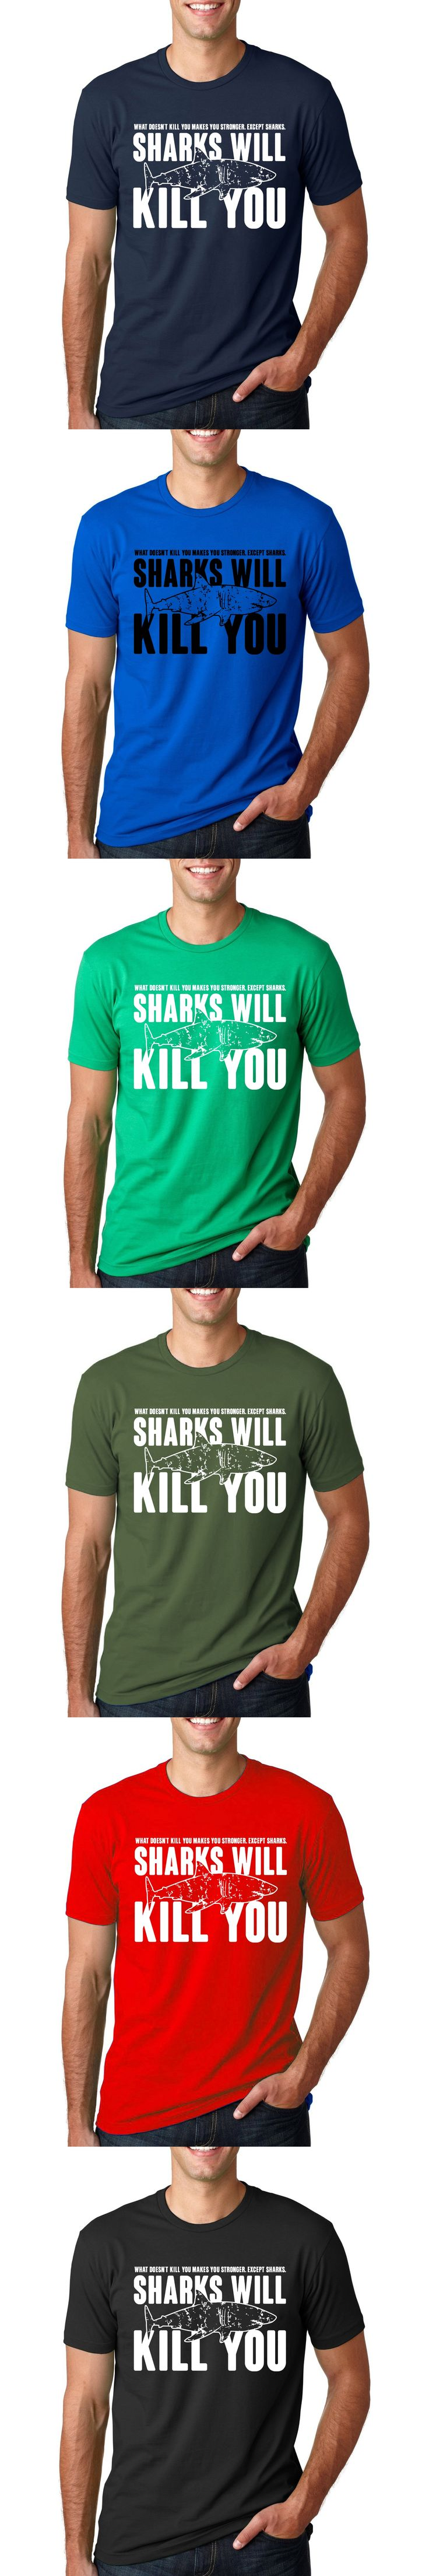 Funny Slogans Printed Sharks Will Kill You T Shirt Men's Streetwear Short Sleeve O-Neck T-Shirt 2017 Summer Fashion Hip Hop Tops